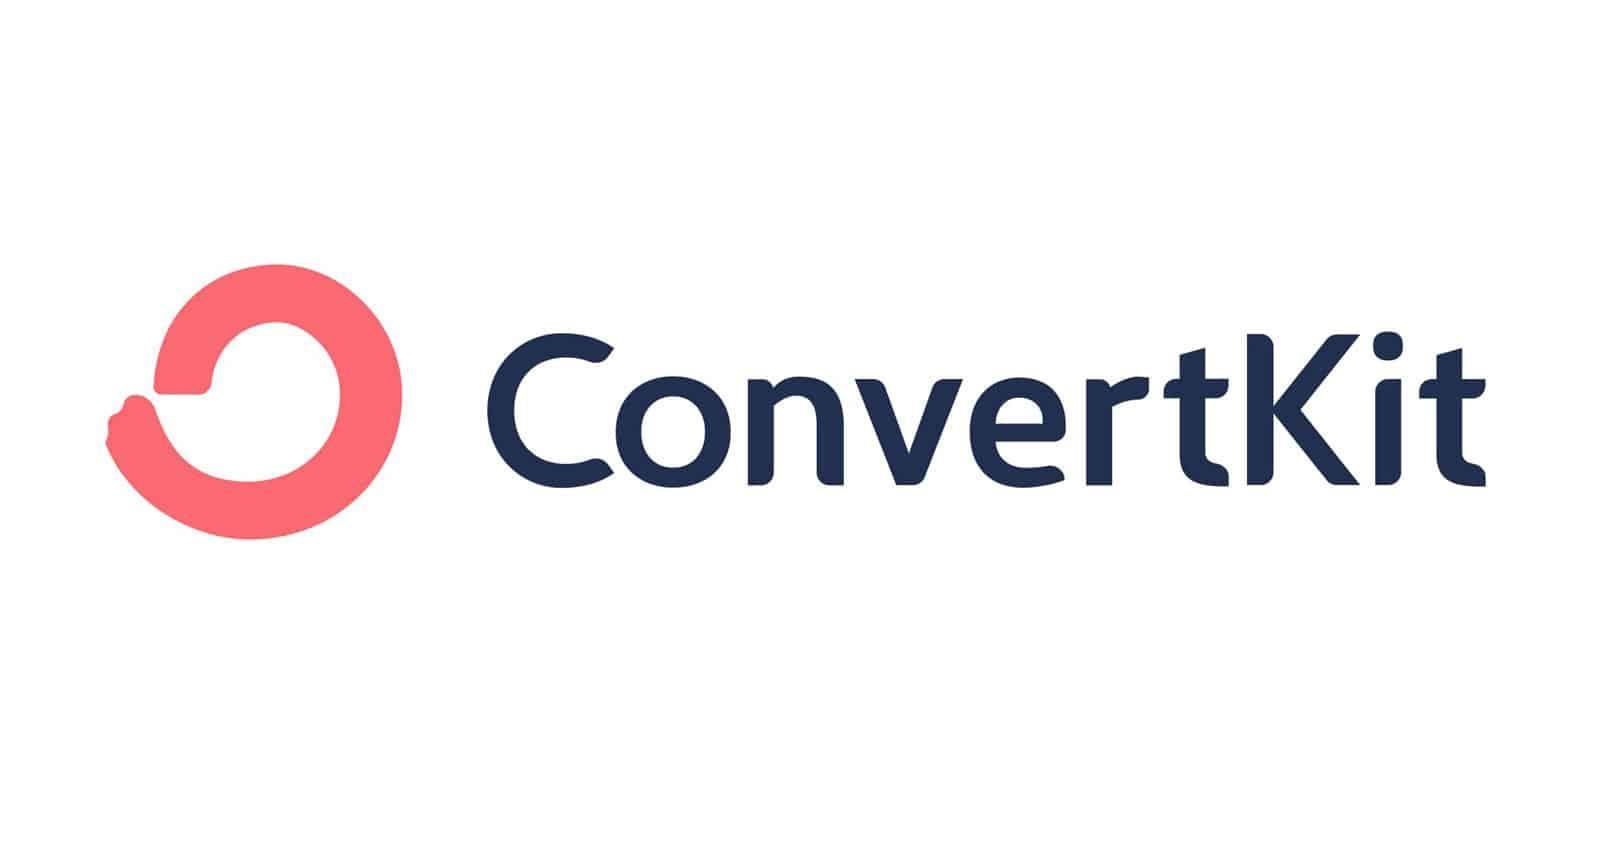 Where do I find my ConvertKit API Key?